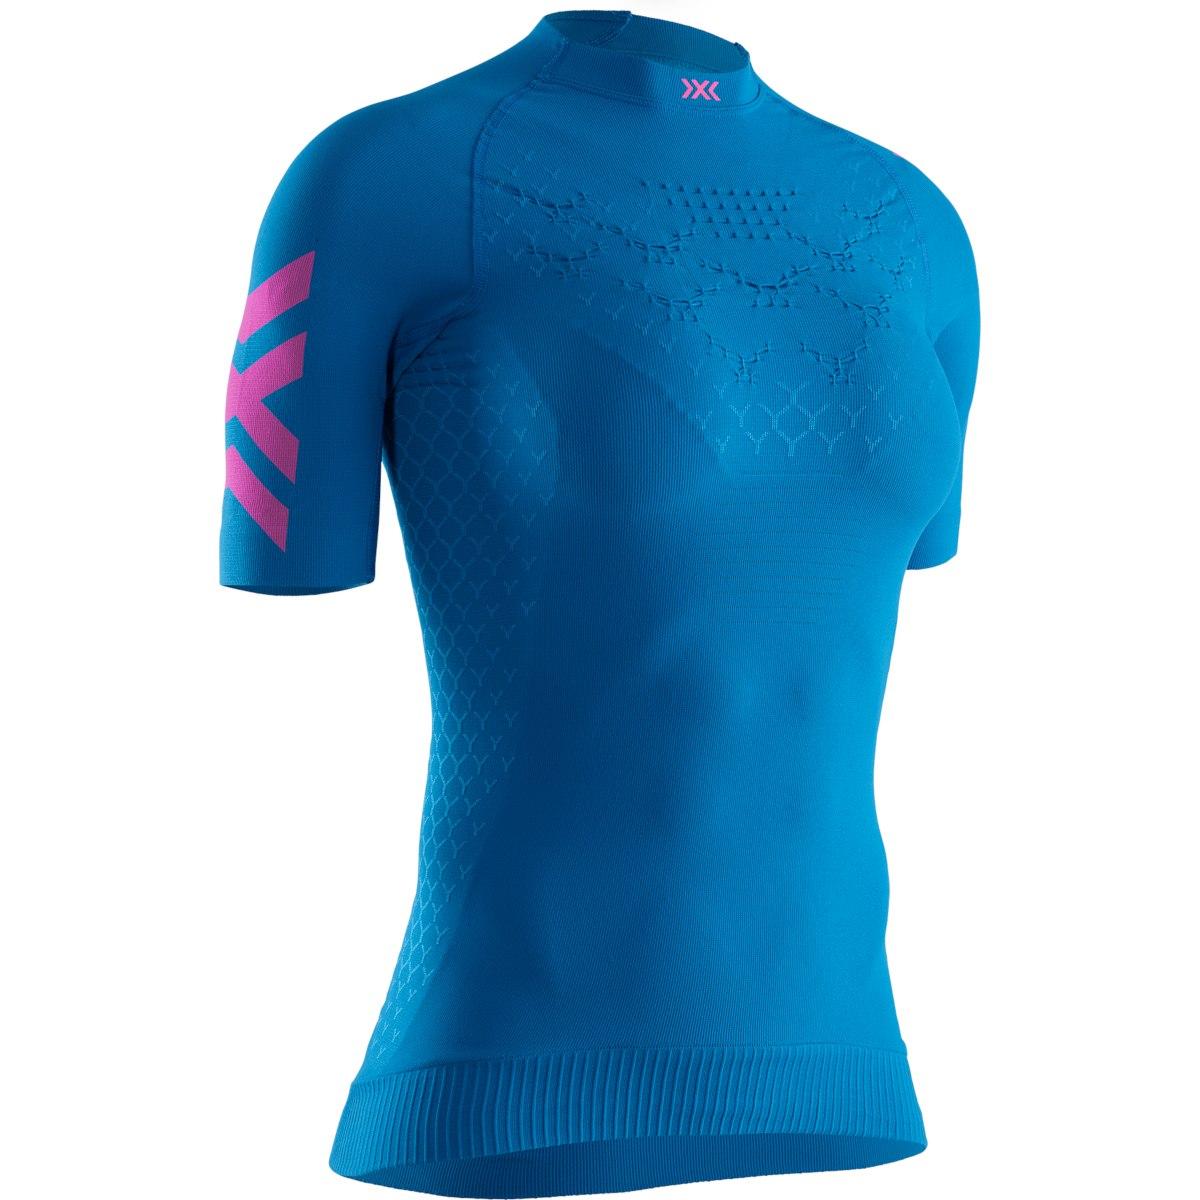 X-Bionic TWYCE 4.0 Run Kurzarm-Laufshirt für Damen - teal blue/neon flamingo